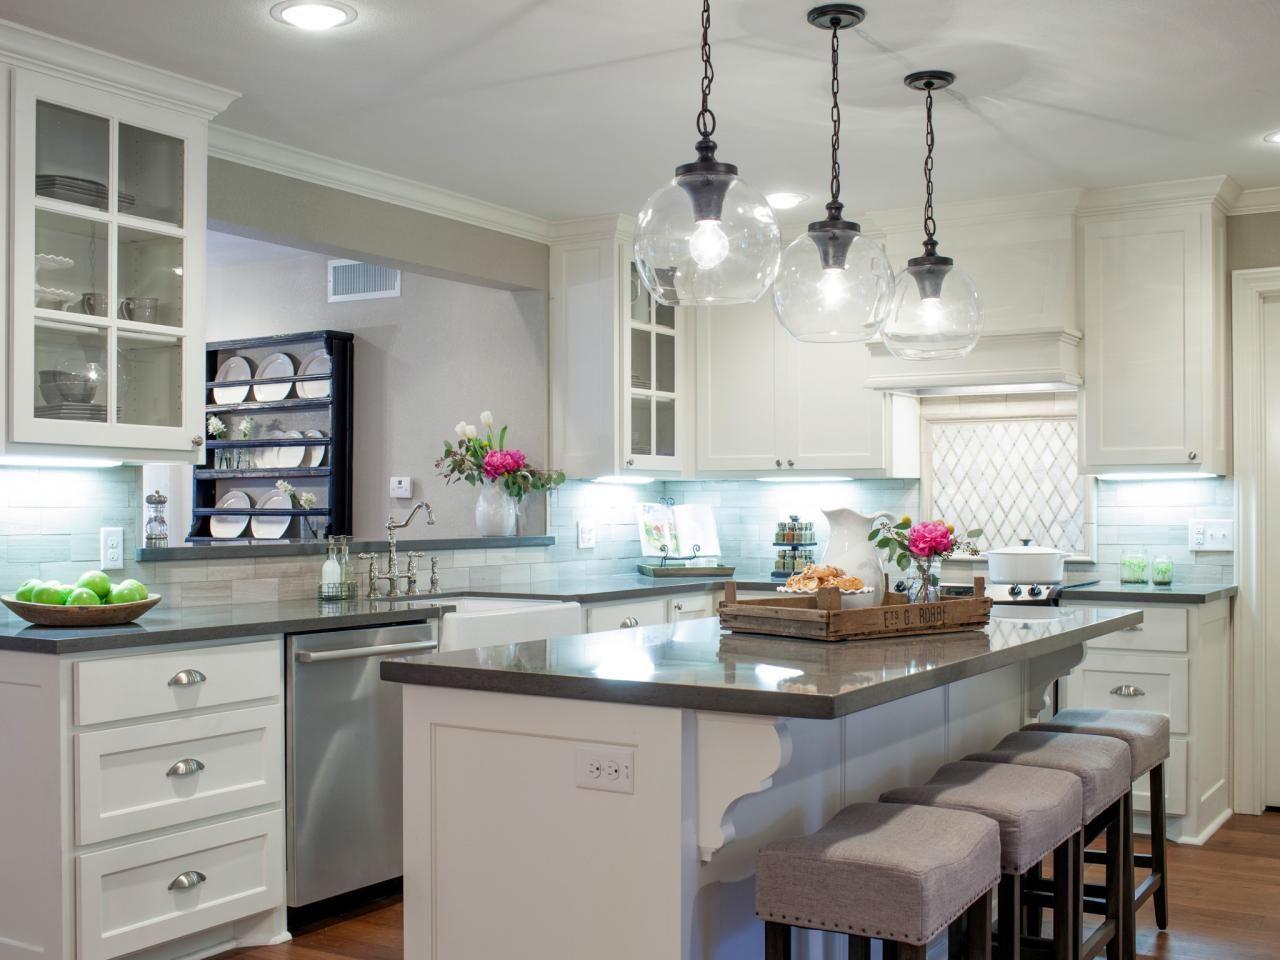 Best Kitchen Makeover Ideas From Fixer Upper Hgtv S Fixer 400 x 300